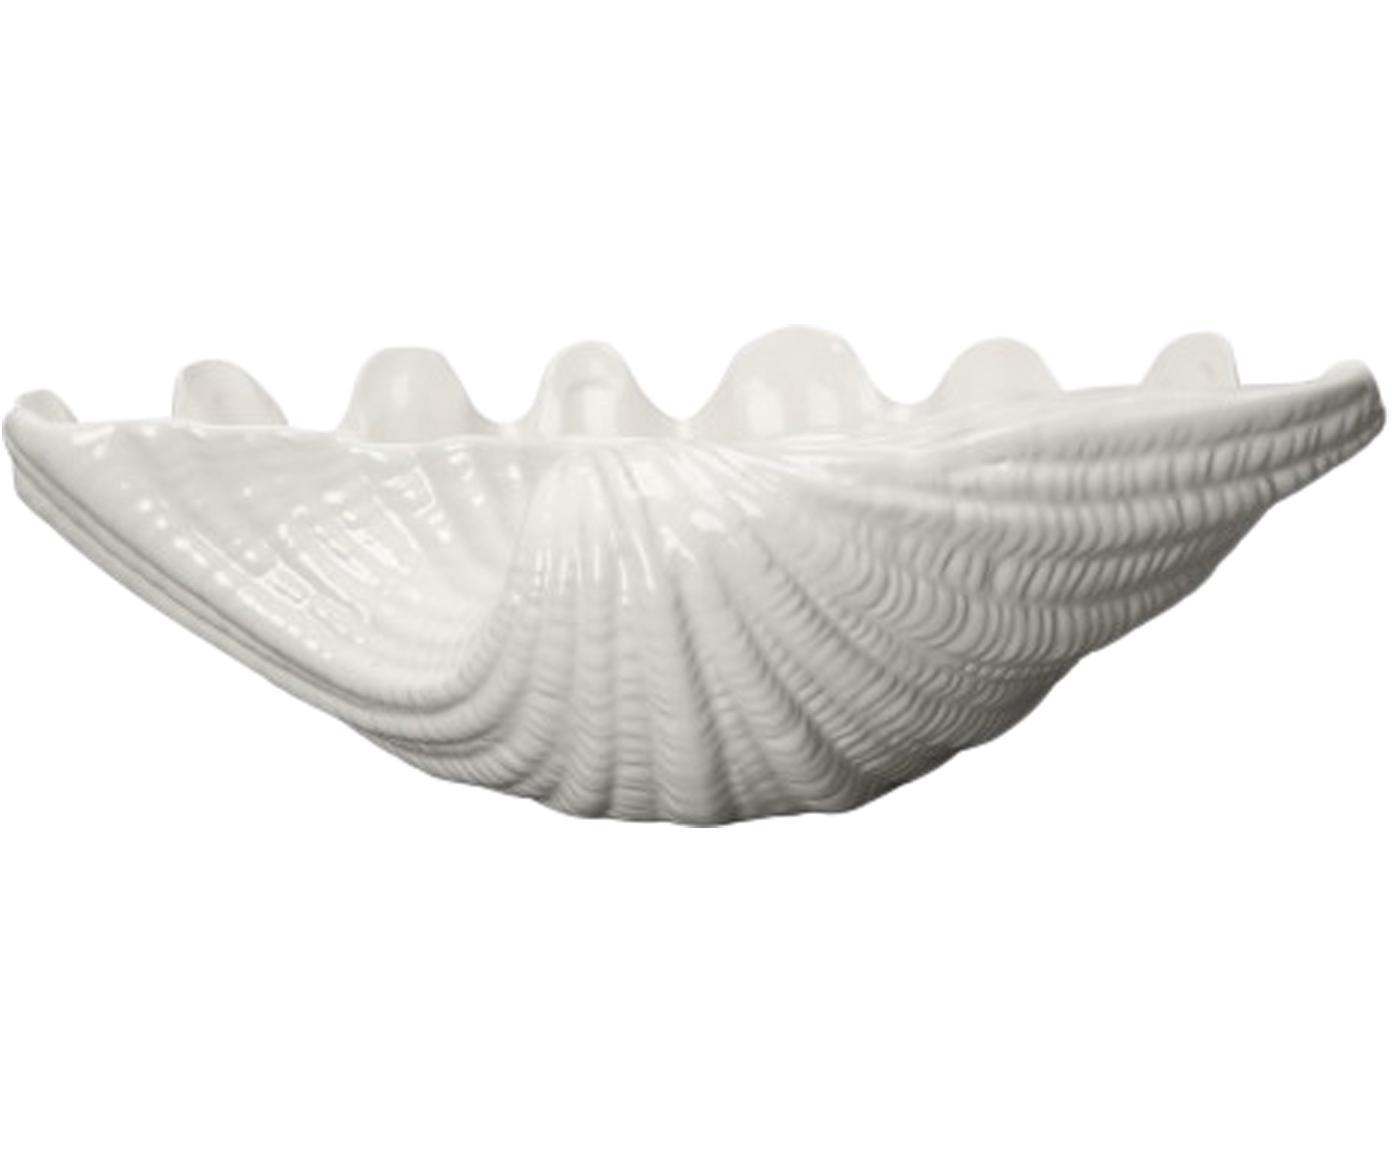 Bol Shell, Cerámica, Blanco, Ø 34 x Al 9 cm